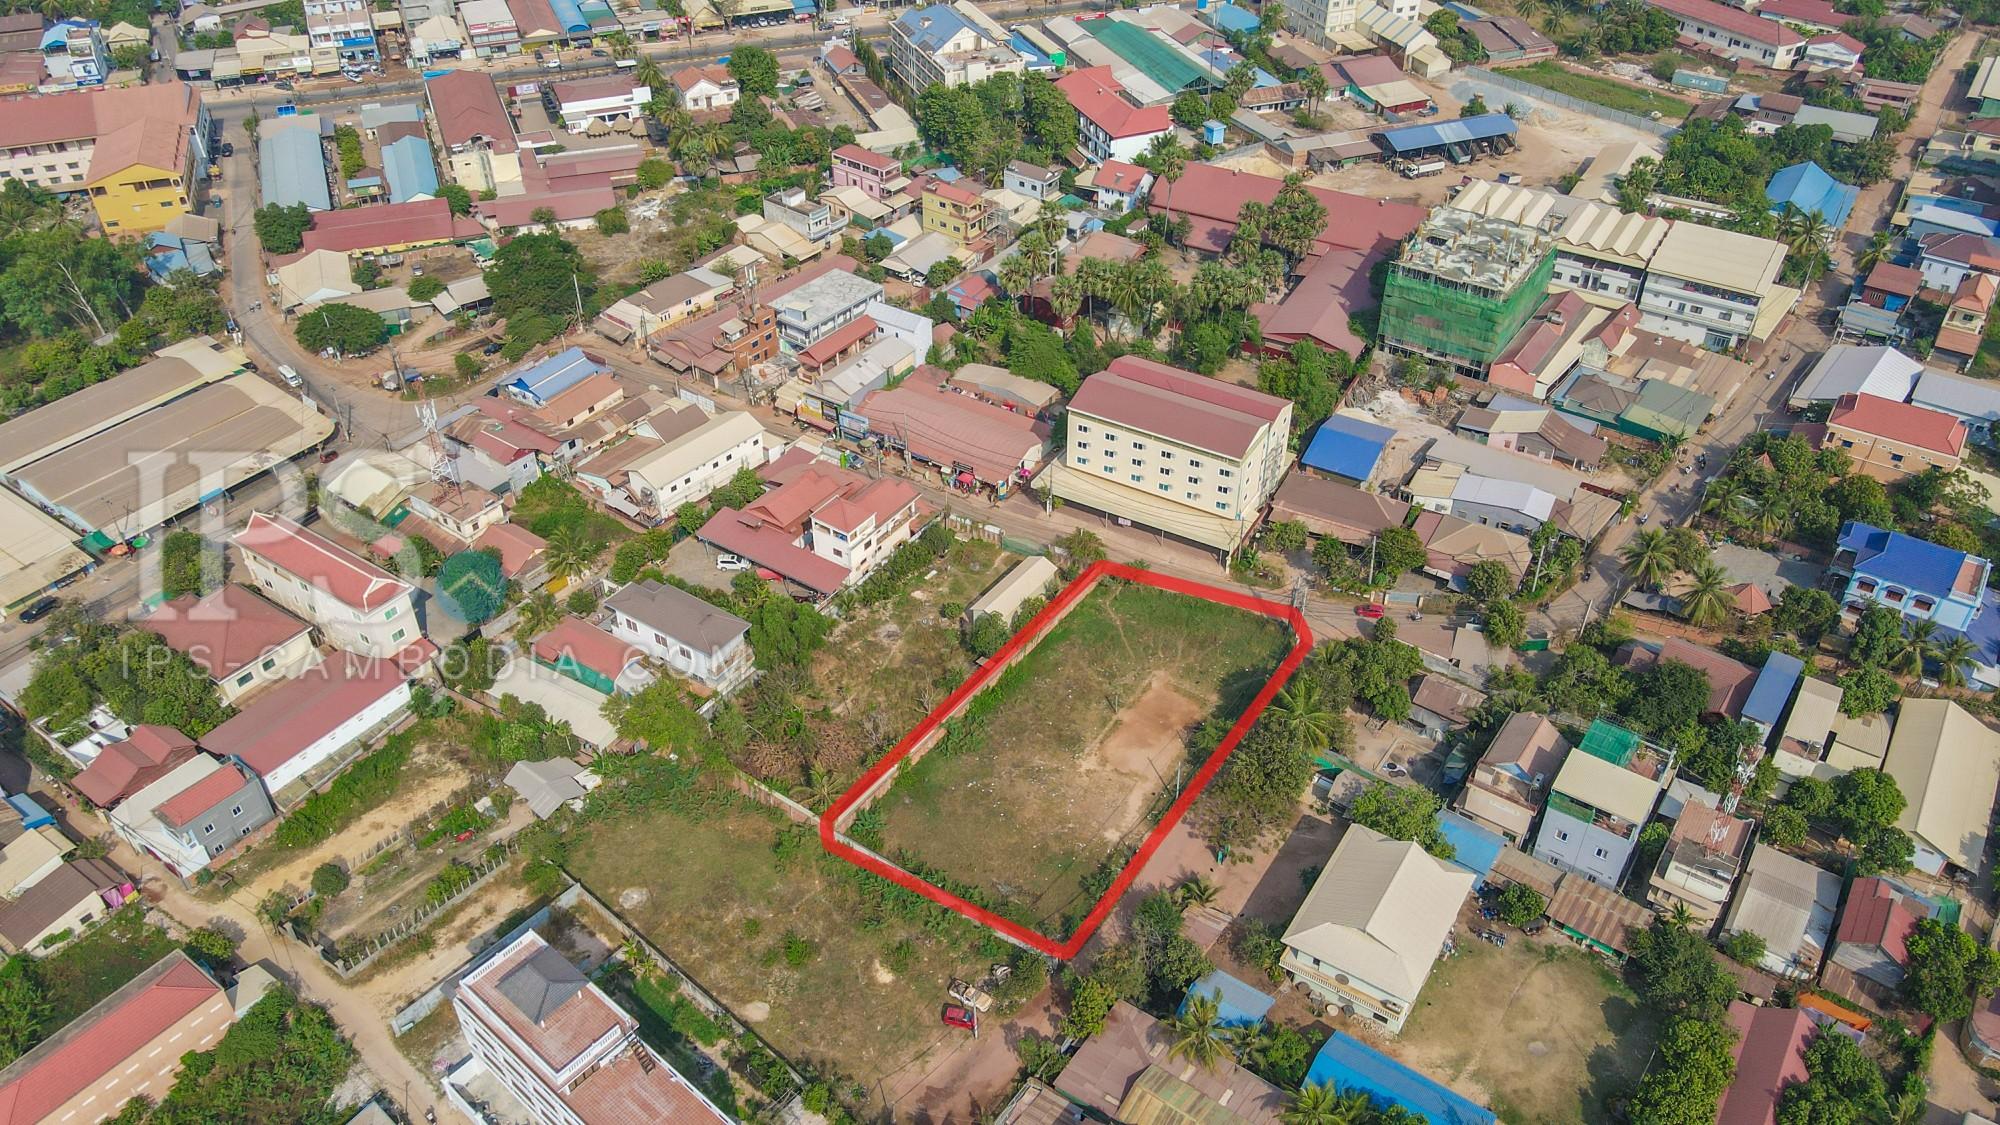 1767 Sqm Residential Land For Sale - Sala Kamreuk, Siem Reap